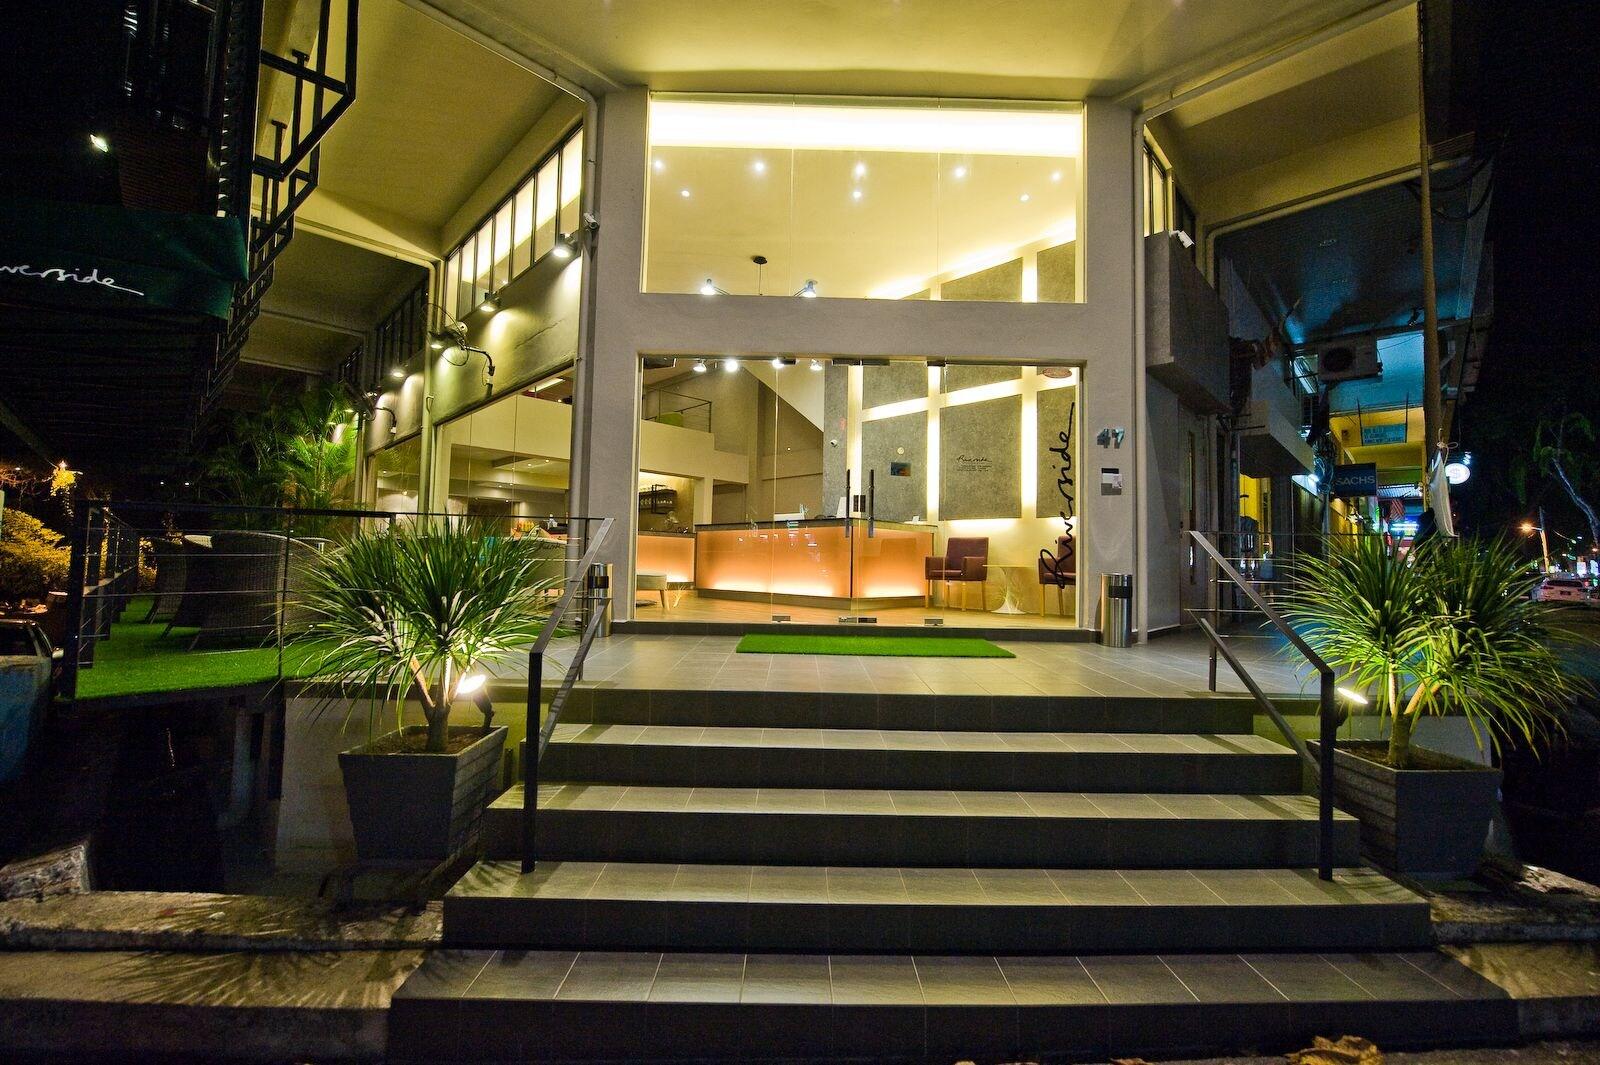 Riverside Boutique Hotel & Cafe, Kuantan